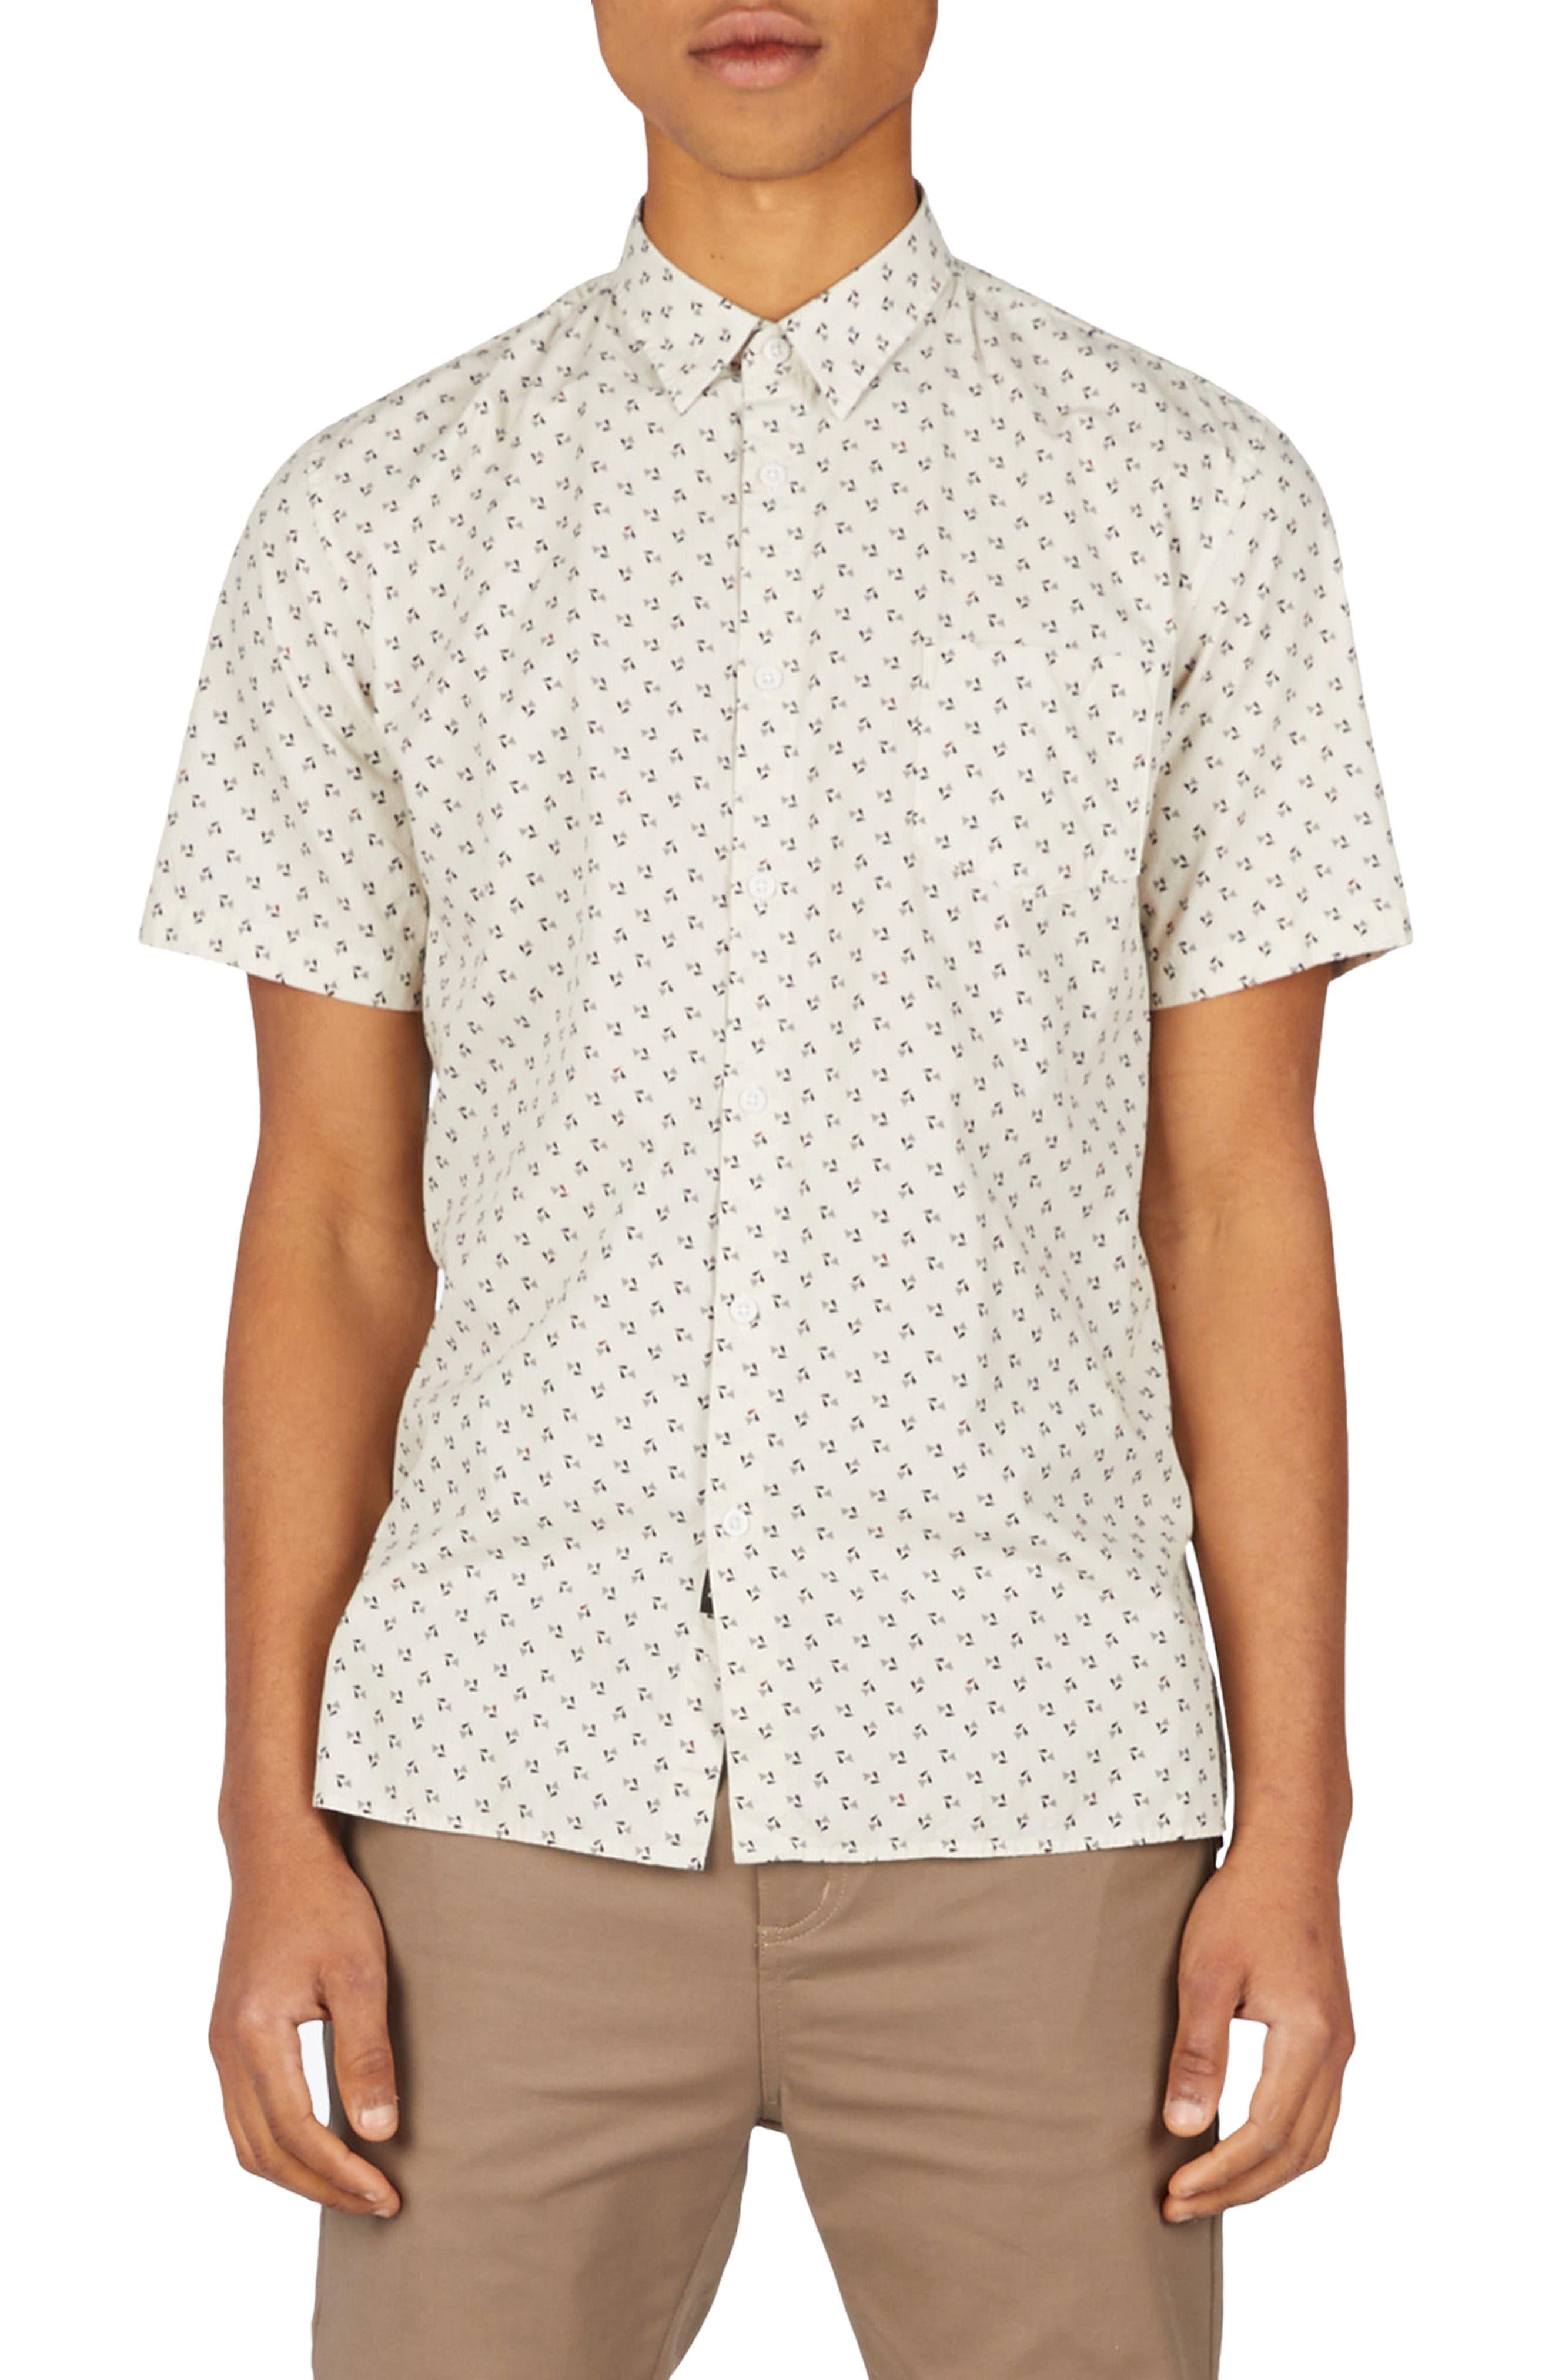 Bass Woven Shirt,                         Main,                         color, 900